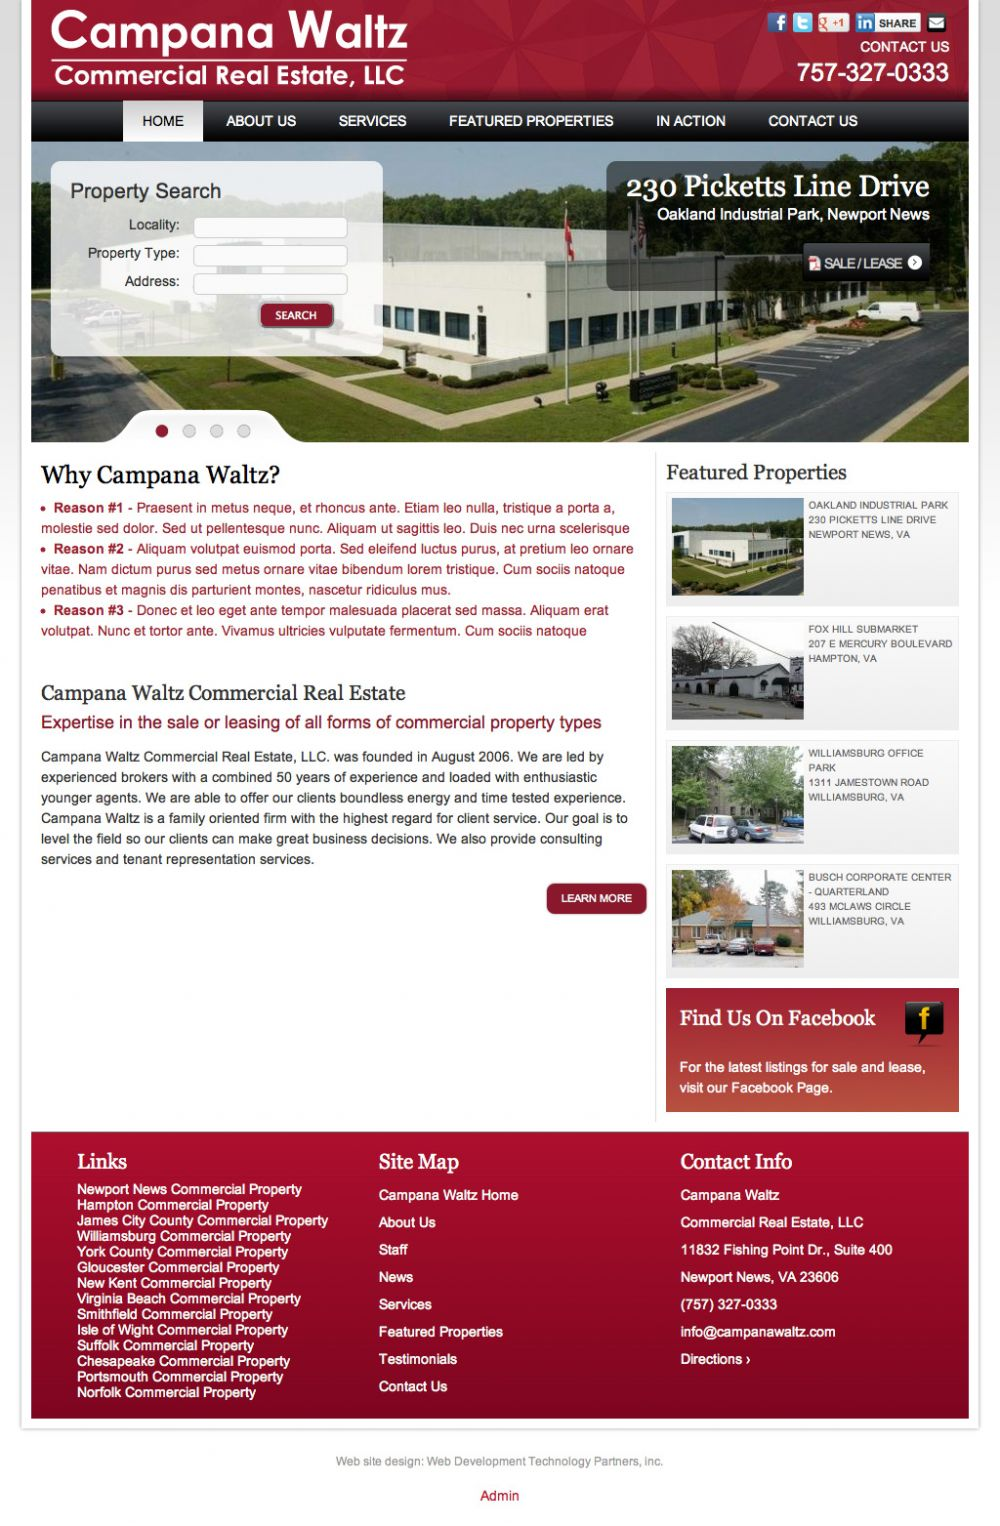 Campana Waltz Commercial Real Estate